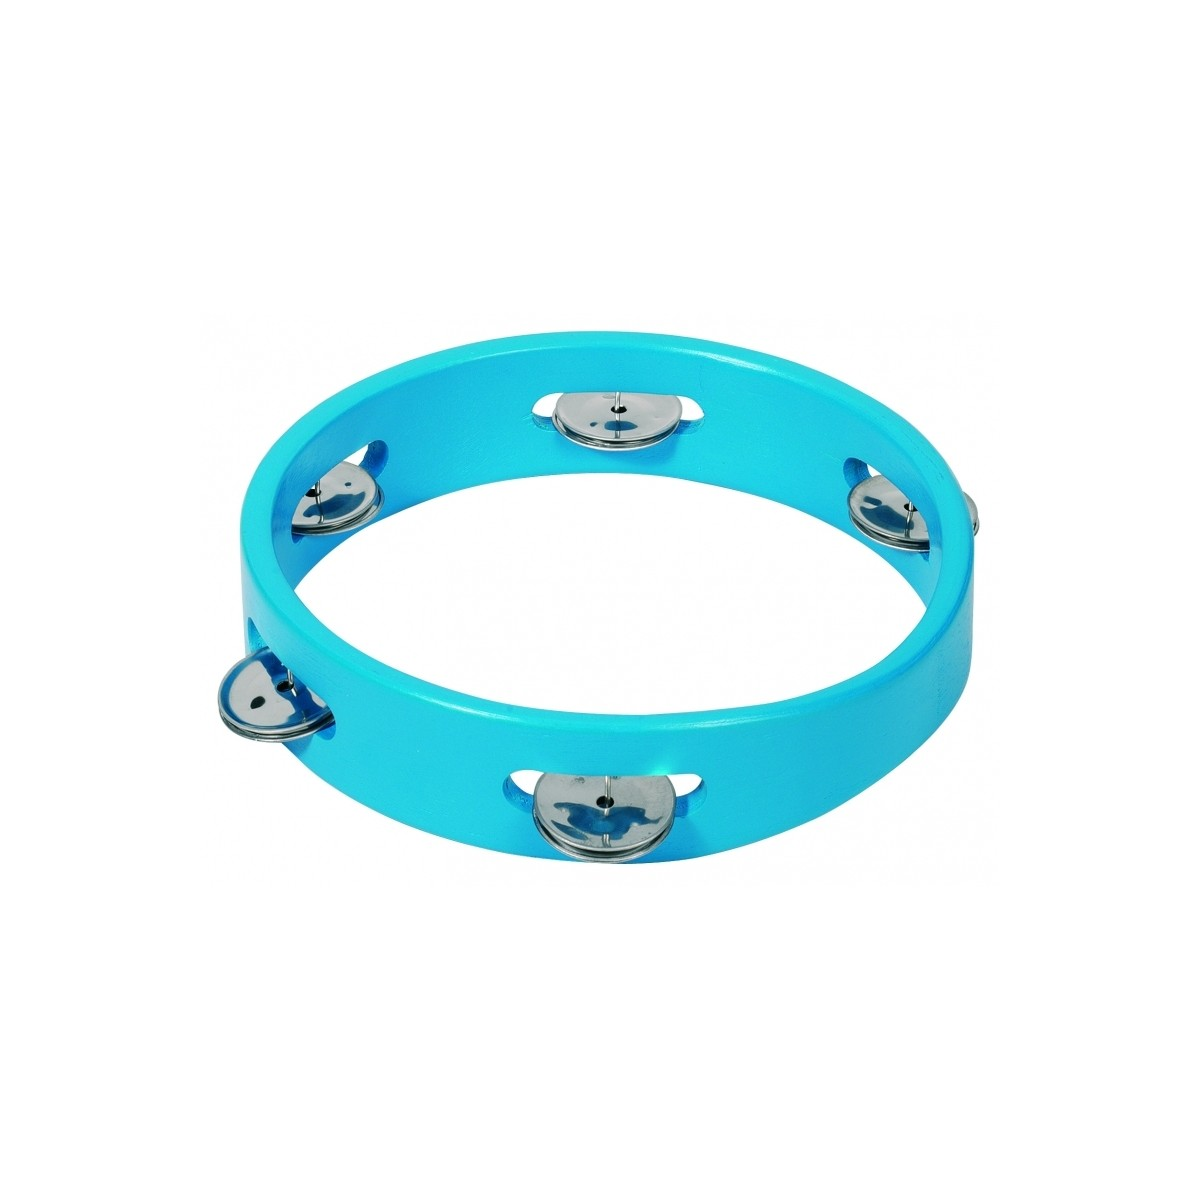 Tambourin Cymbalettes Bois Bleu 8''